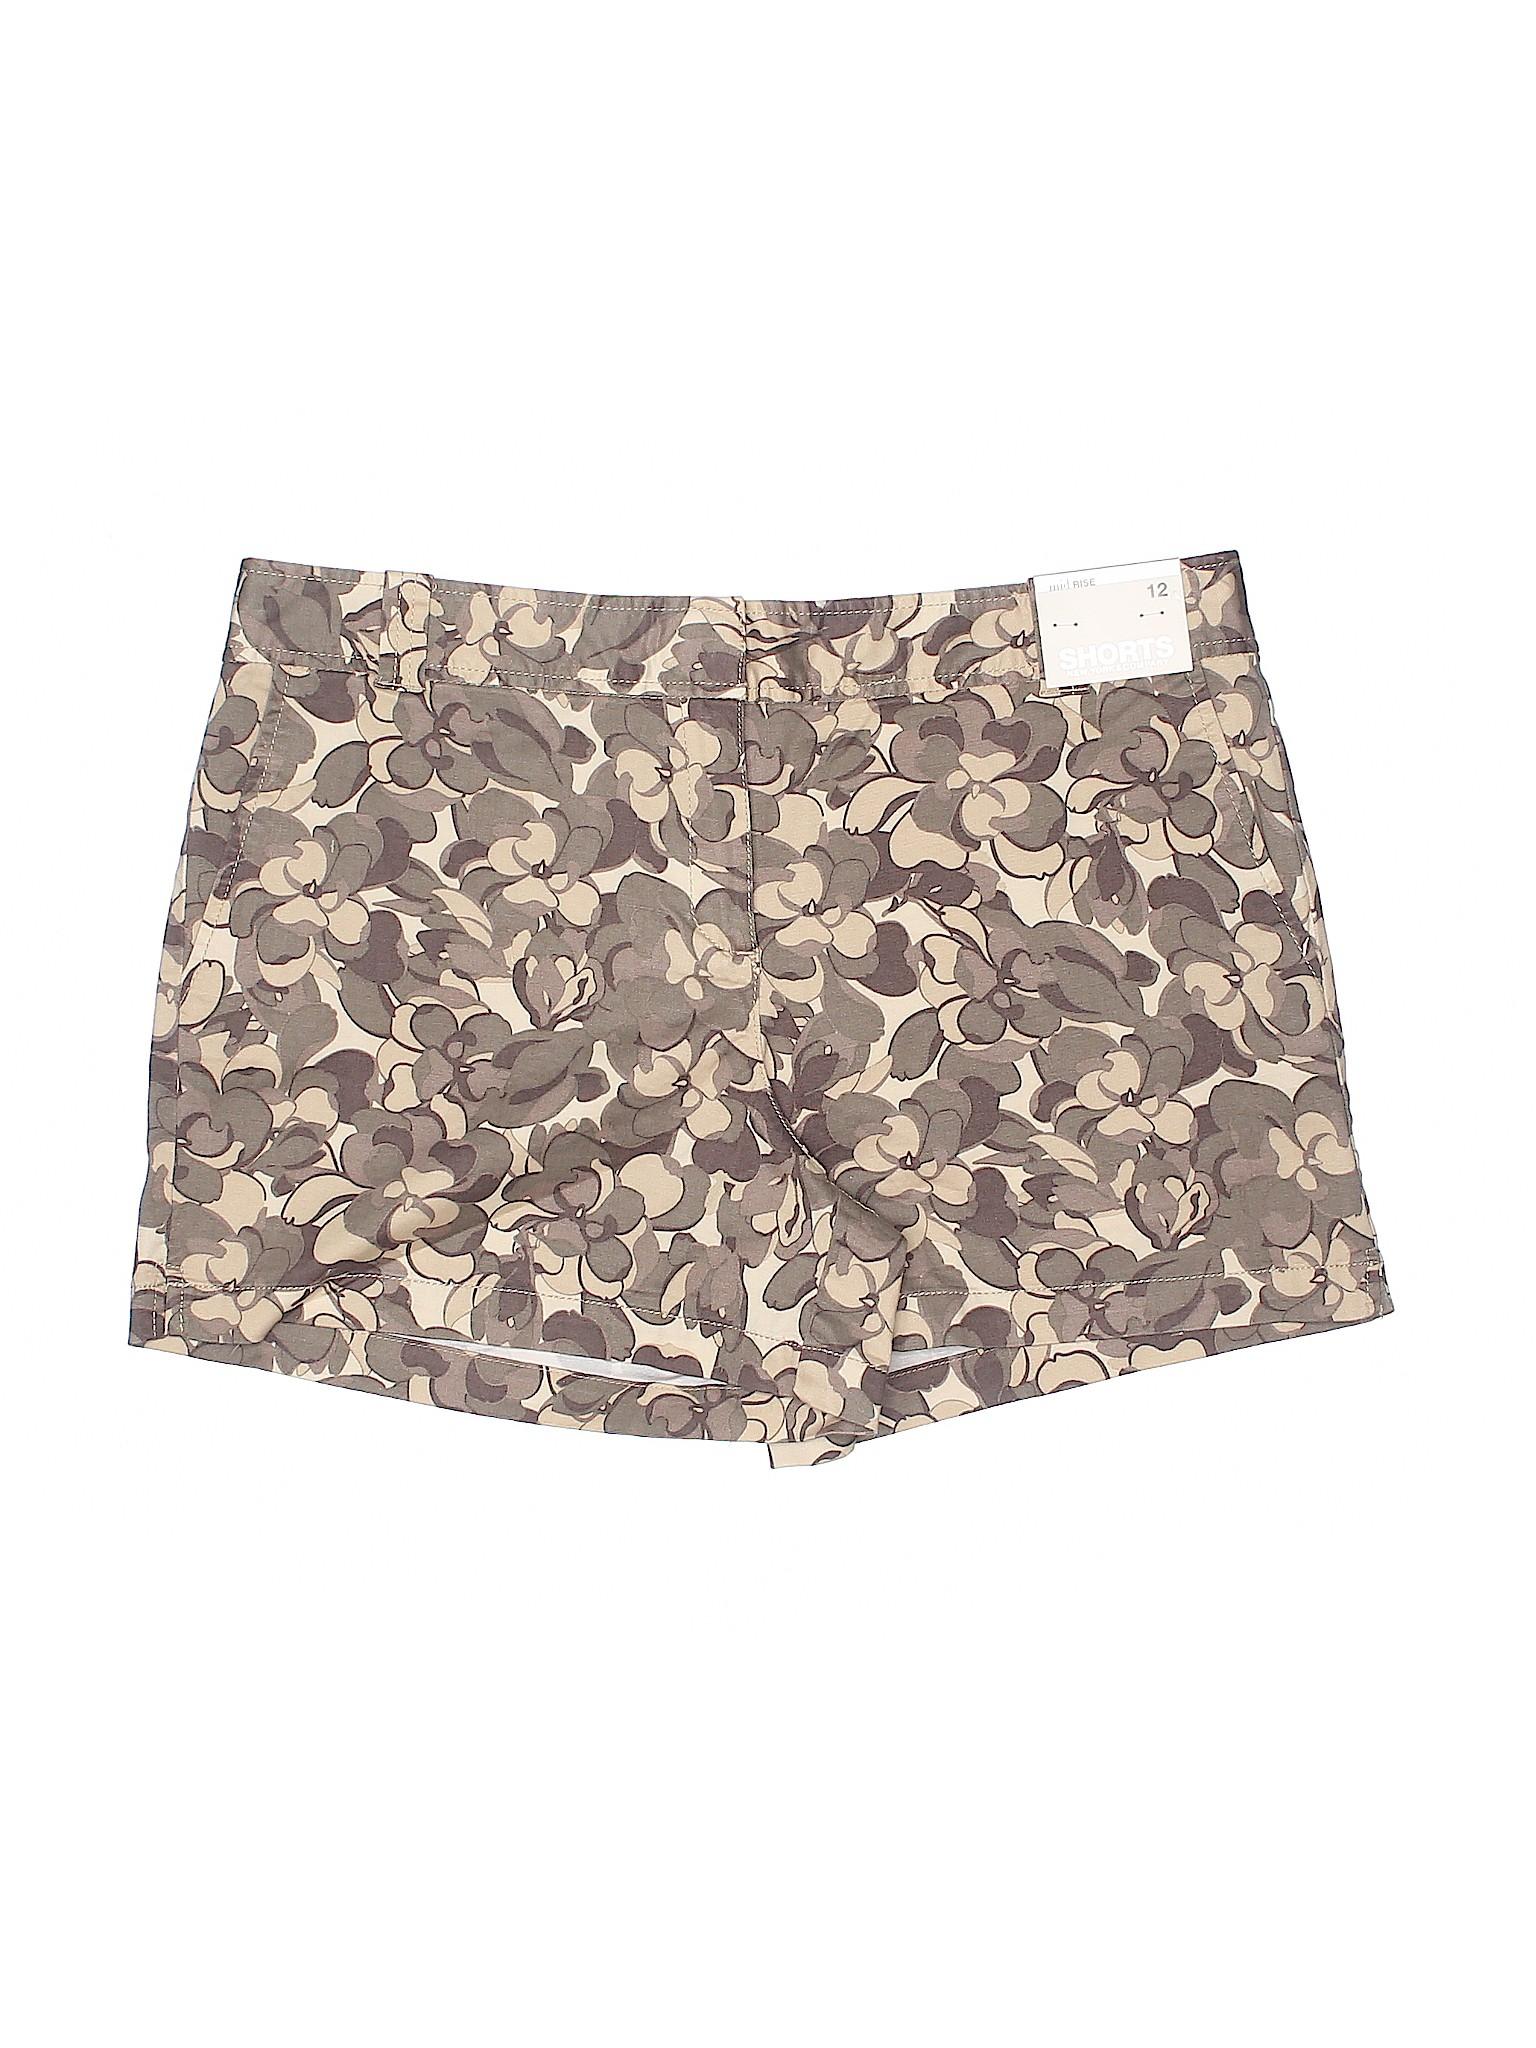 Khaki Boutique Company York leisure amp; Shorts New 66wXfqST